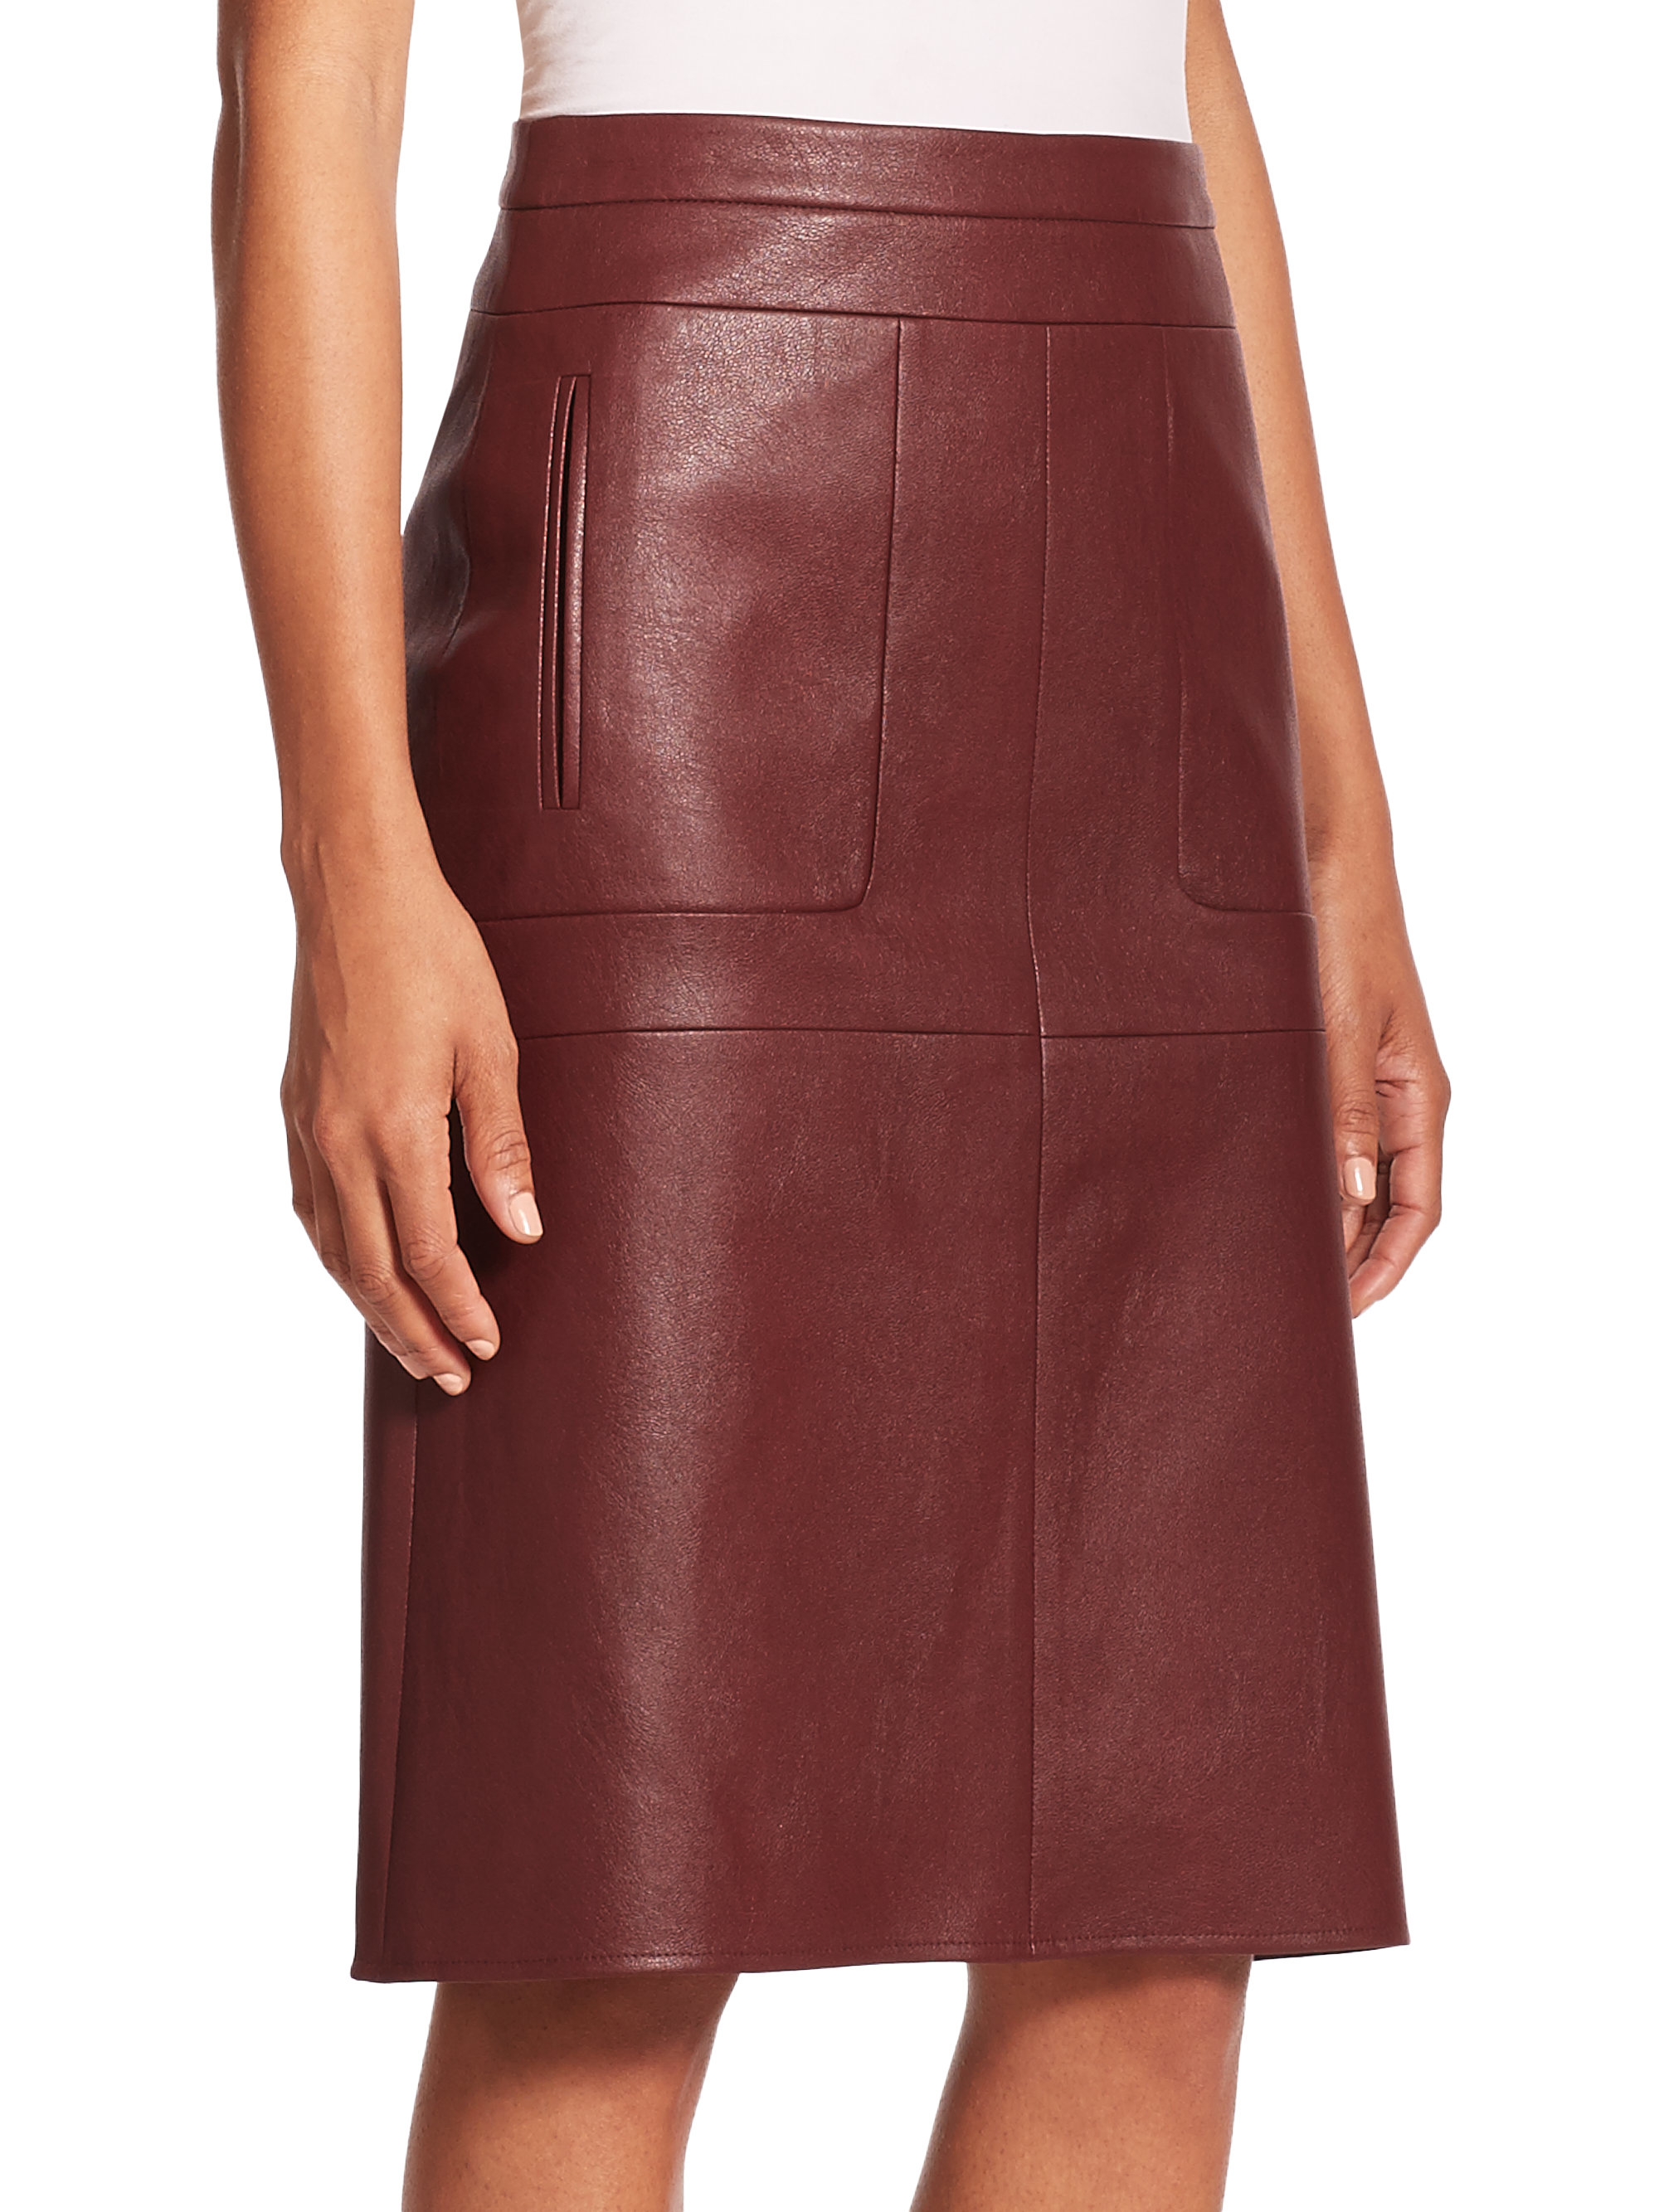 c22dd9aca Leather Midi Skirt With Pockets